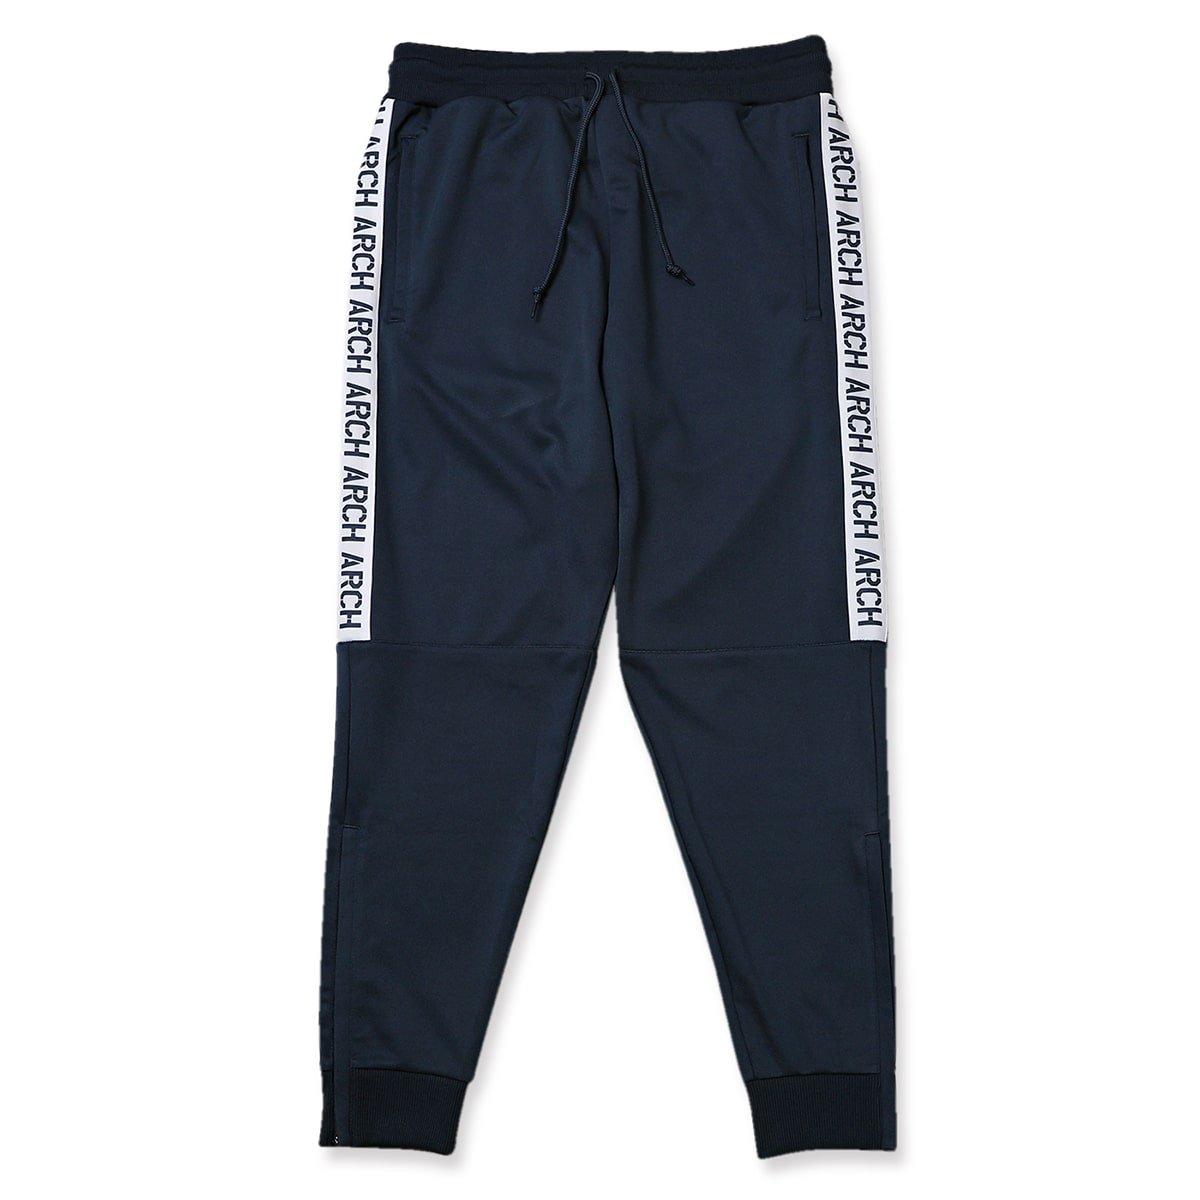 stencil jogger pants【navy】